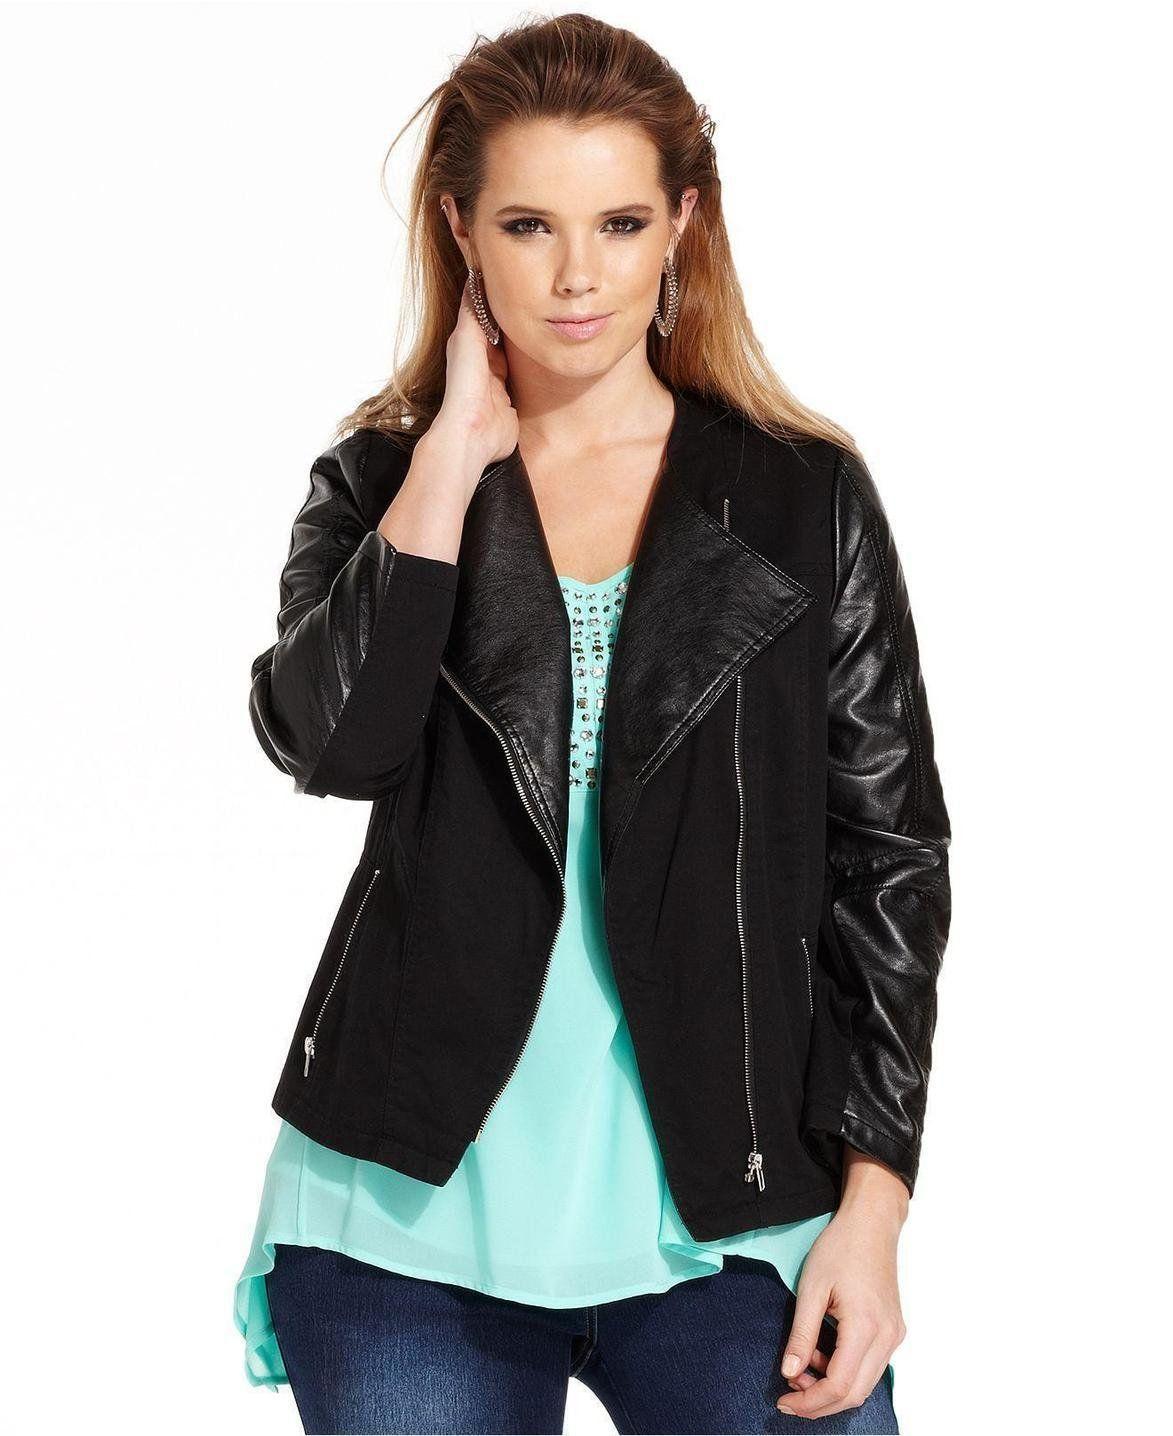 Plus Modamix Plus Size FauxLeather Moto Jacket Leather